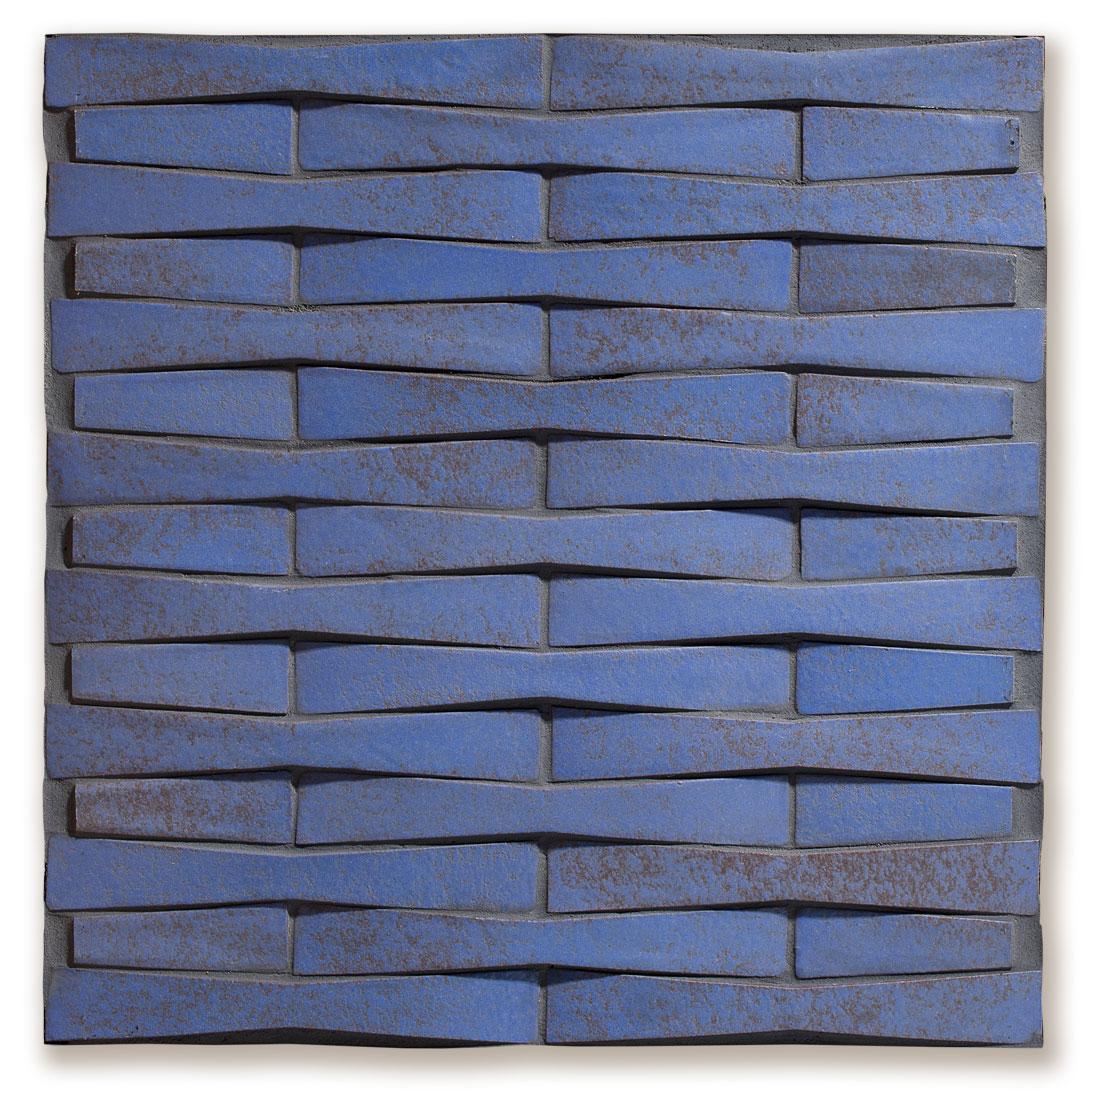 Ceramic Wall Cladding : Ceramic d wall cladding